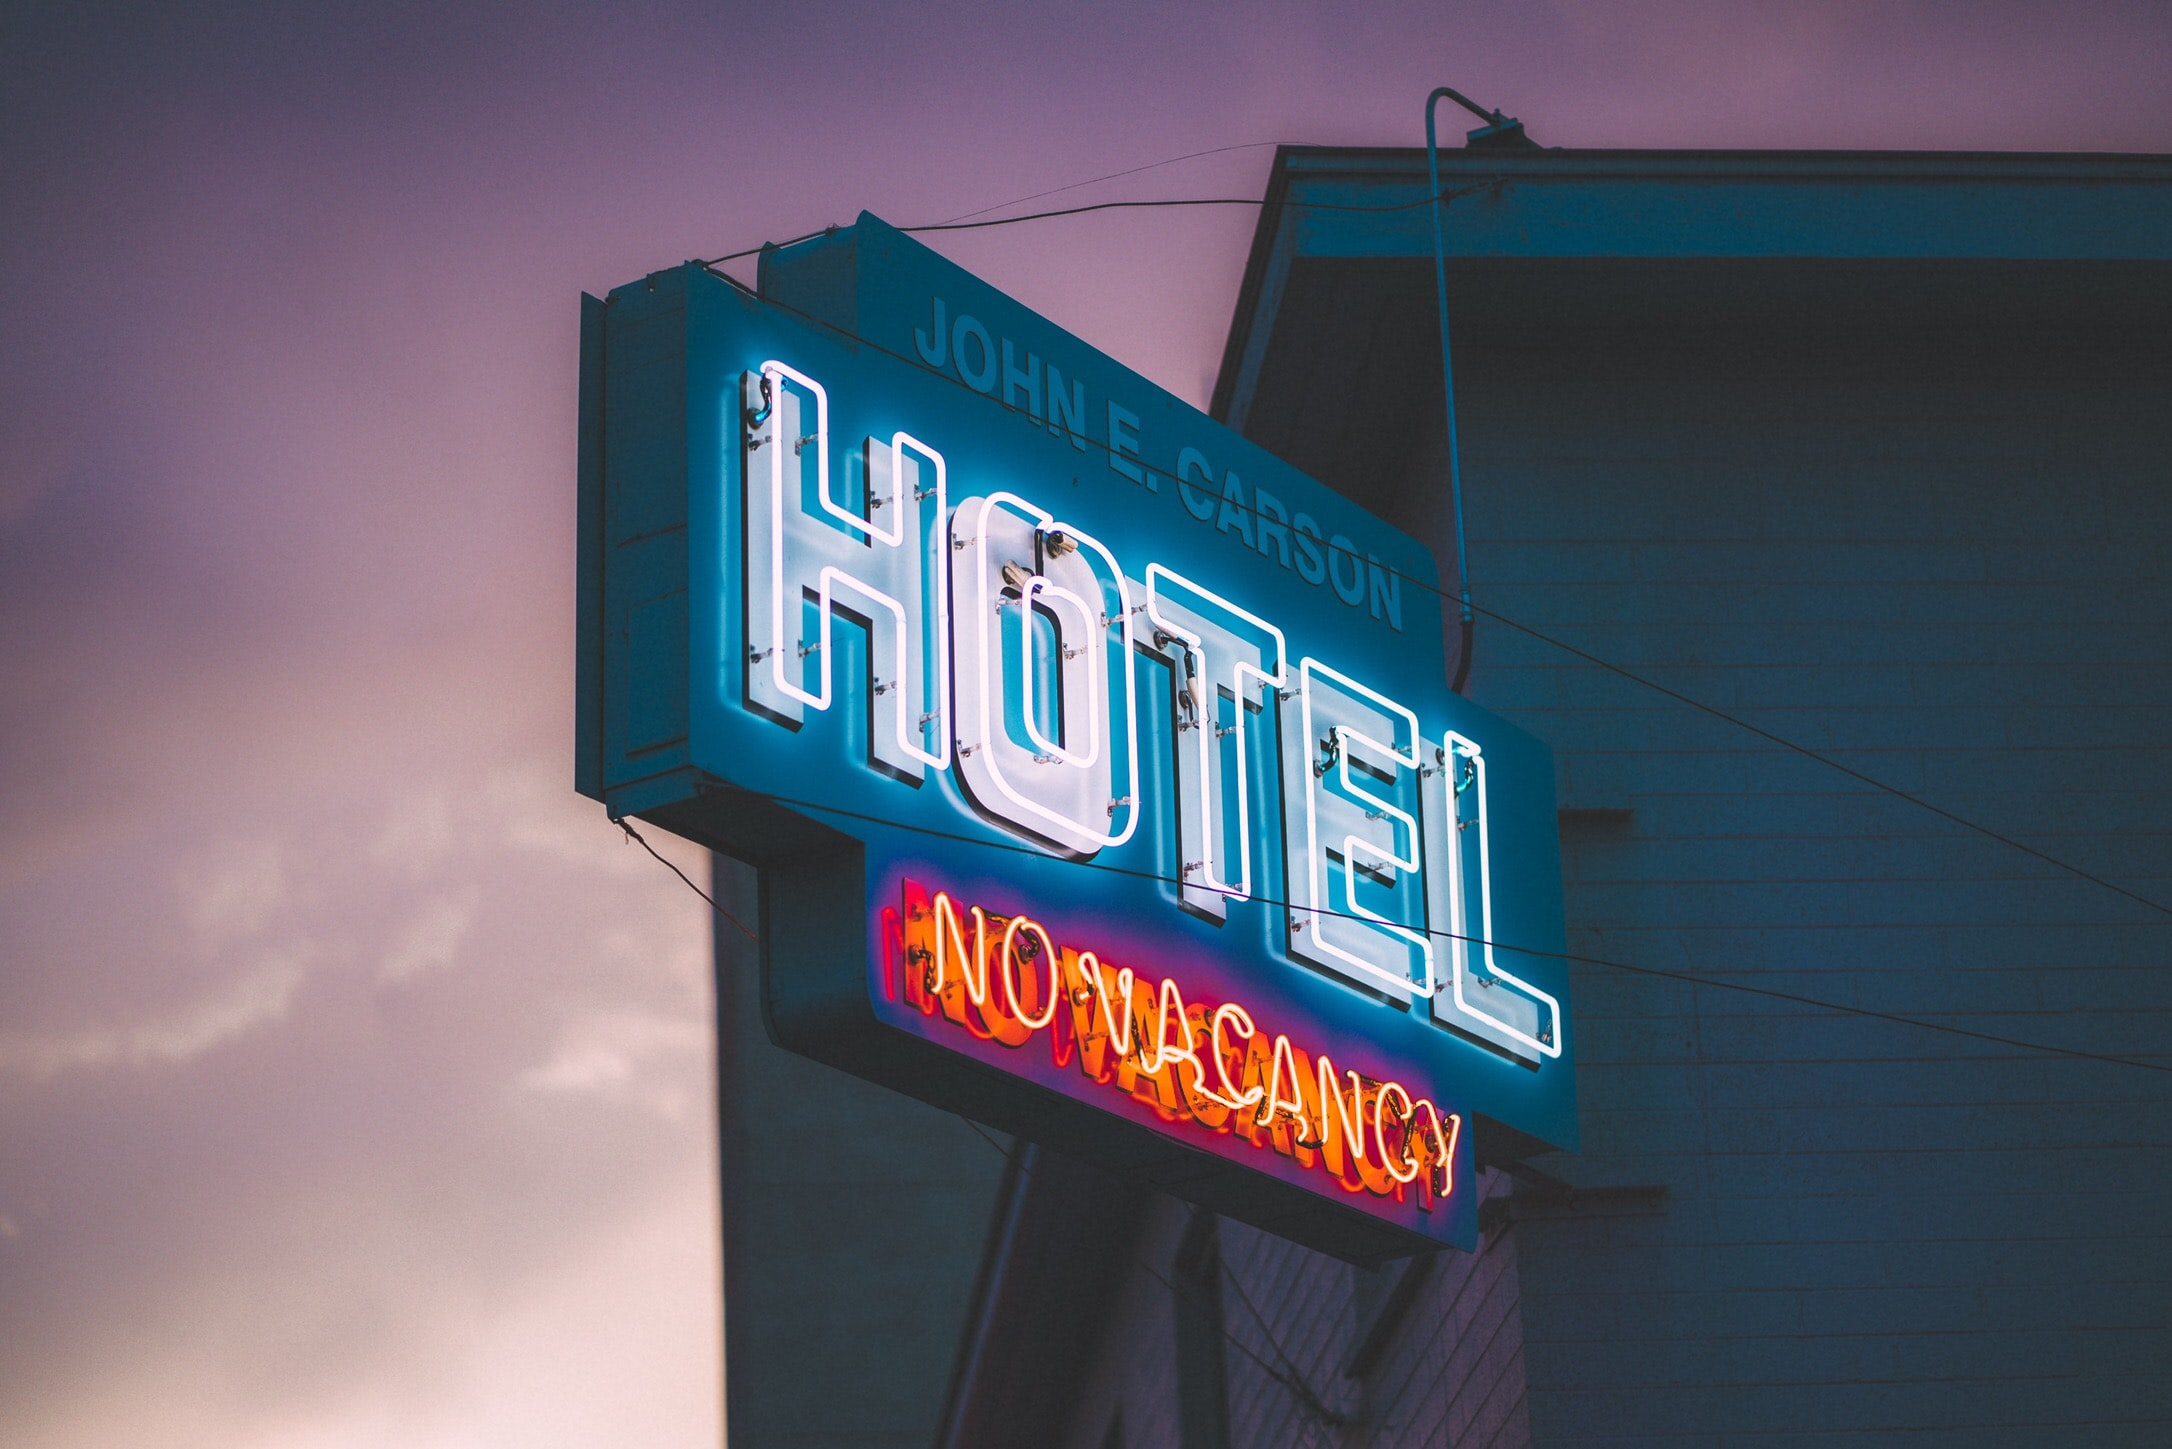 John E. Carson hotel no vacancy neon light signage